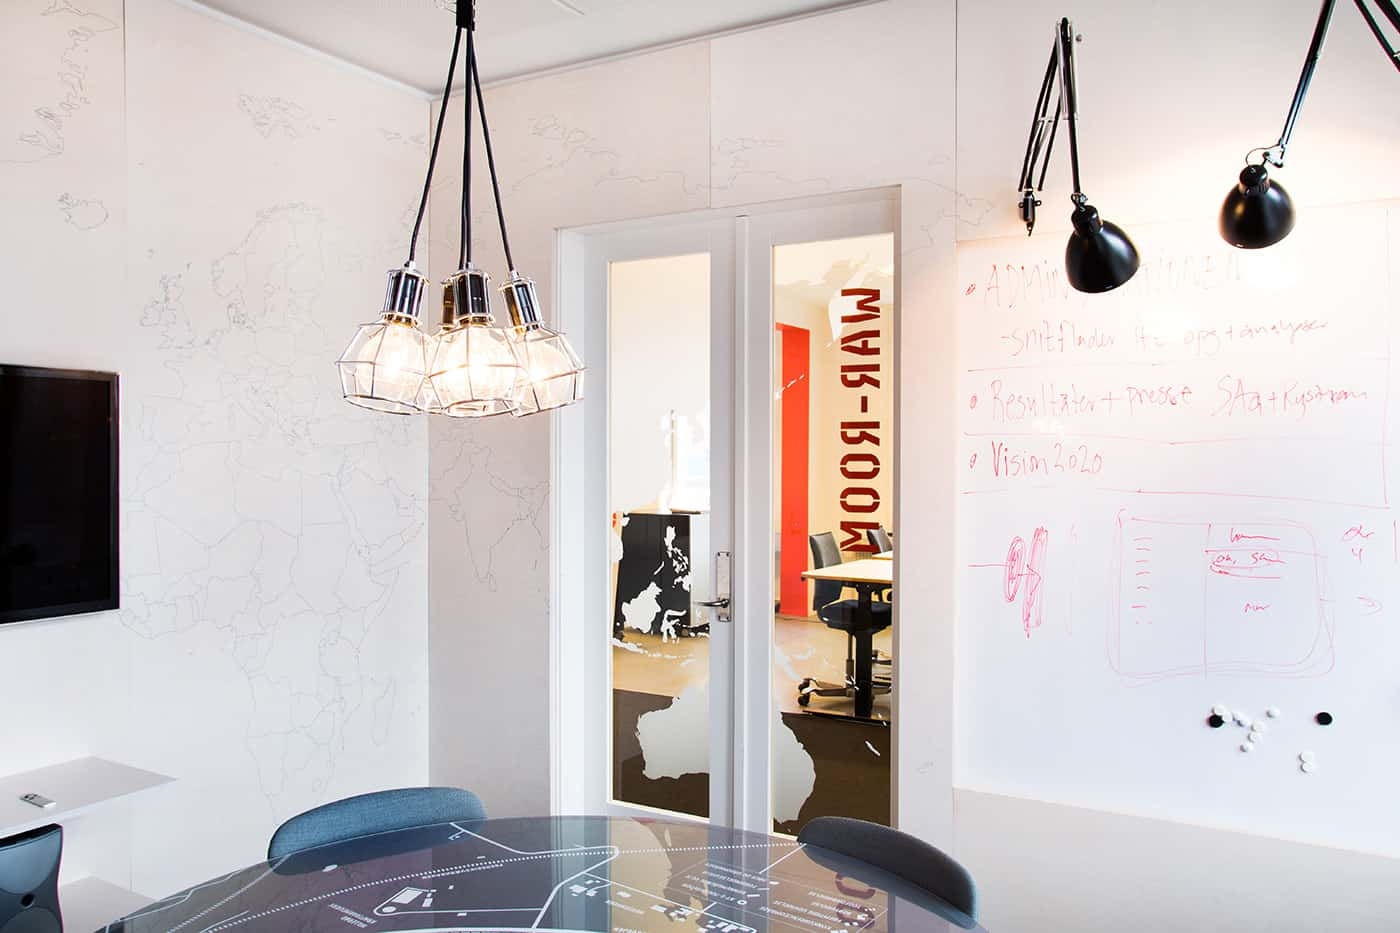 RITAarch, indretning, spaceplanning, kontorindretning, mødelokale, wareroom, specialinventar, specialdesign, Nyt hospital Nordsjælland projekthus